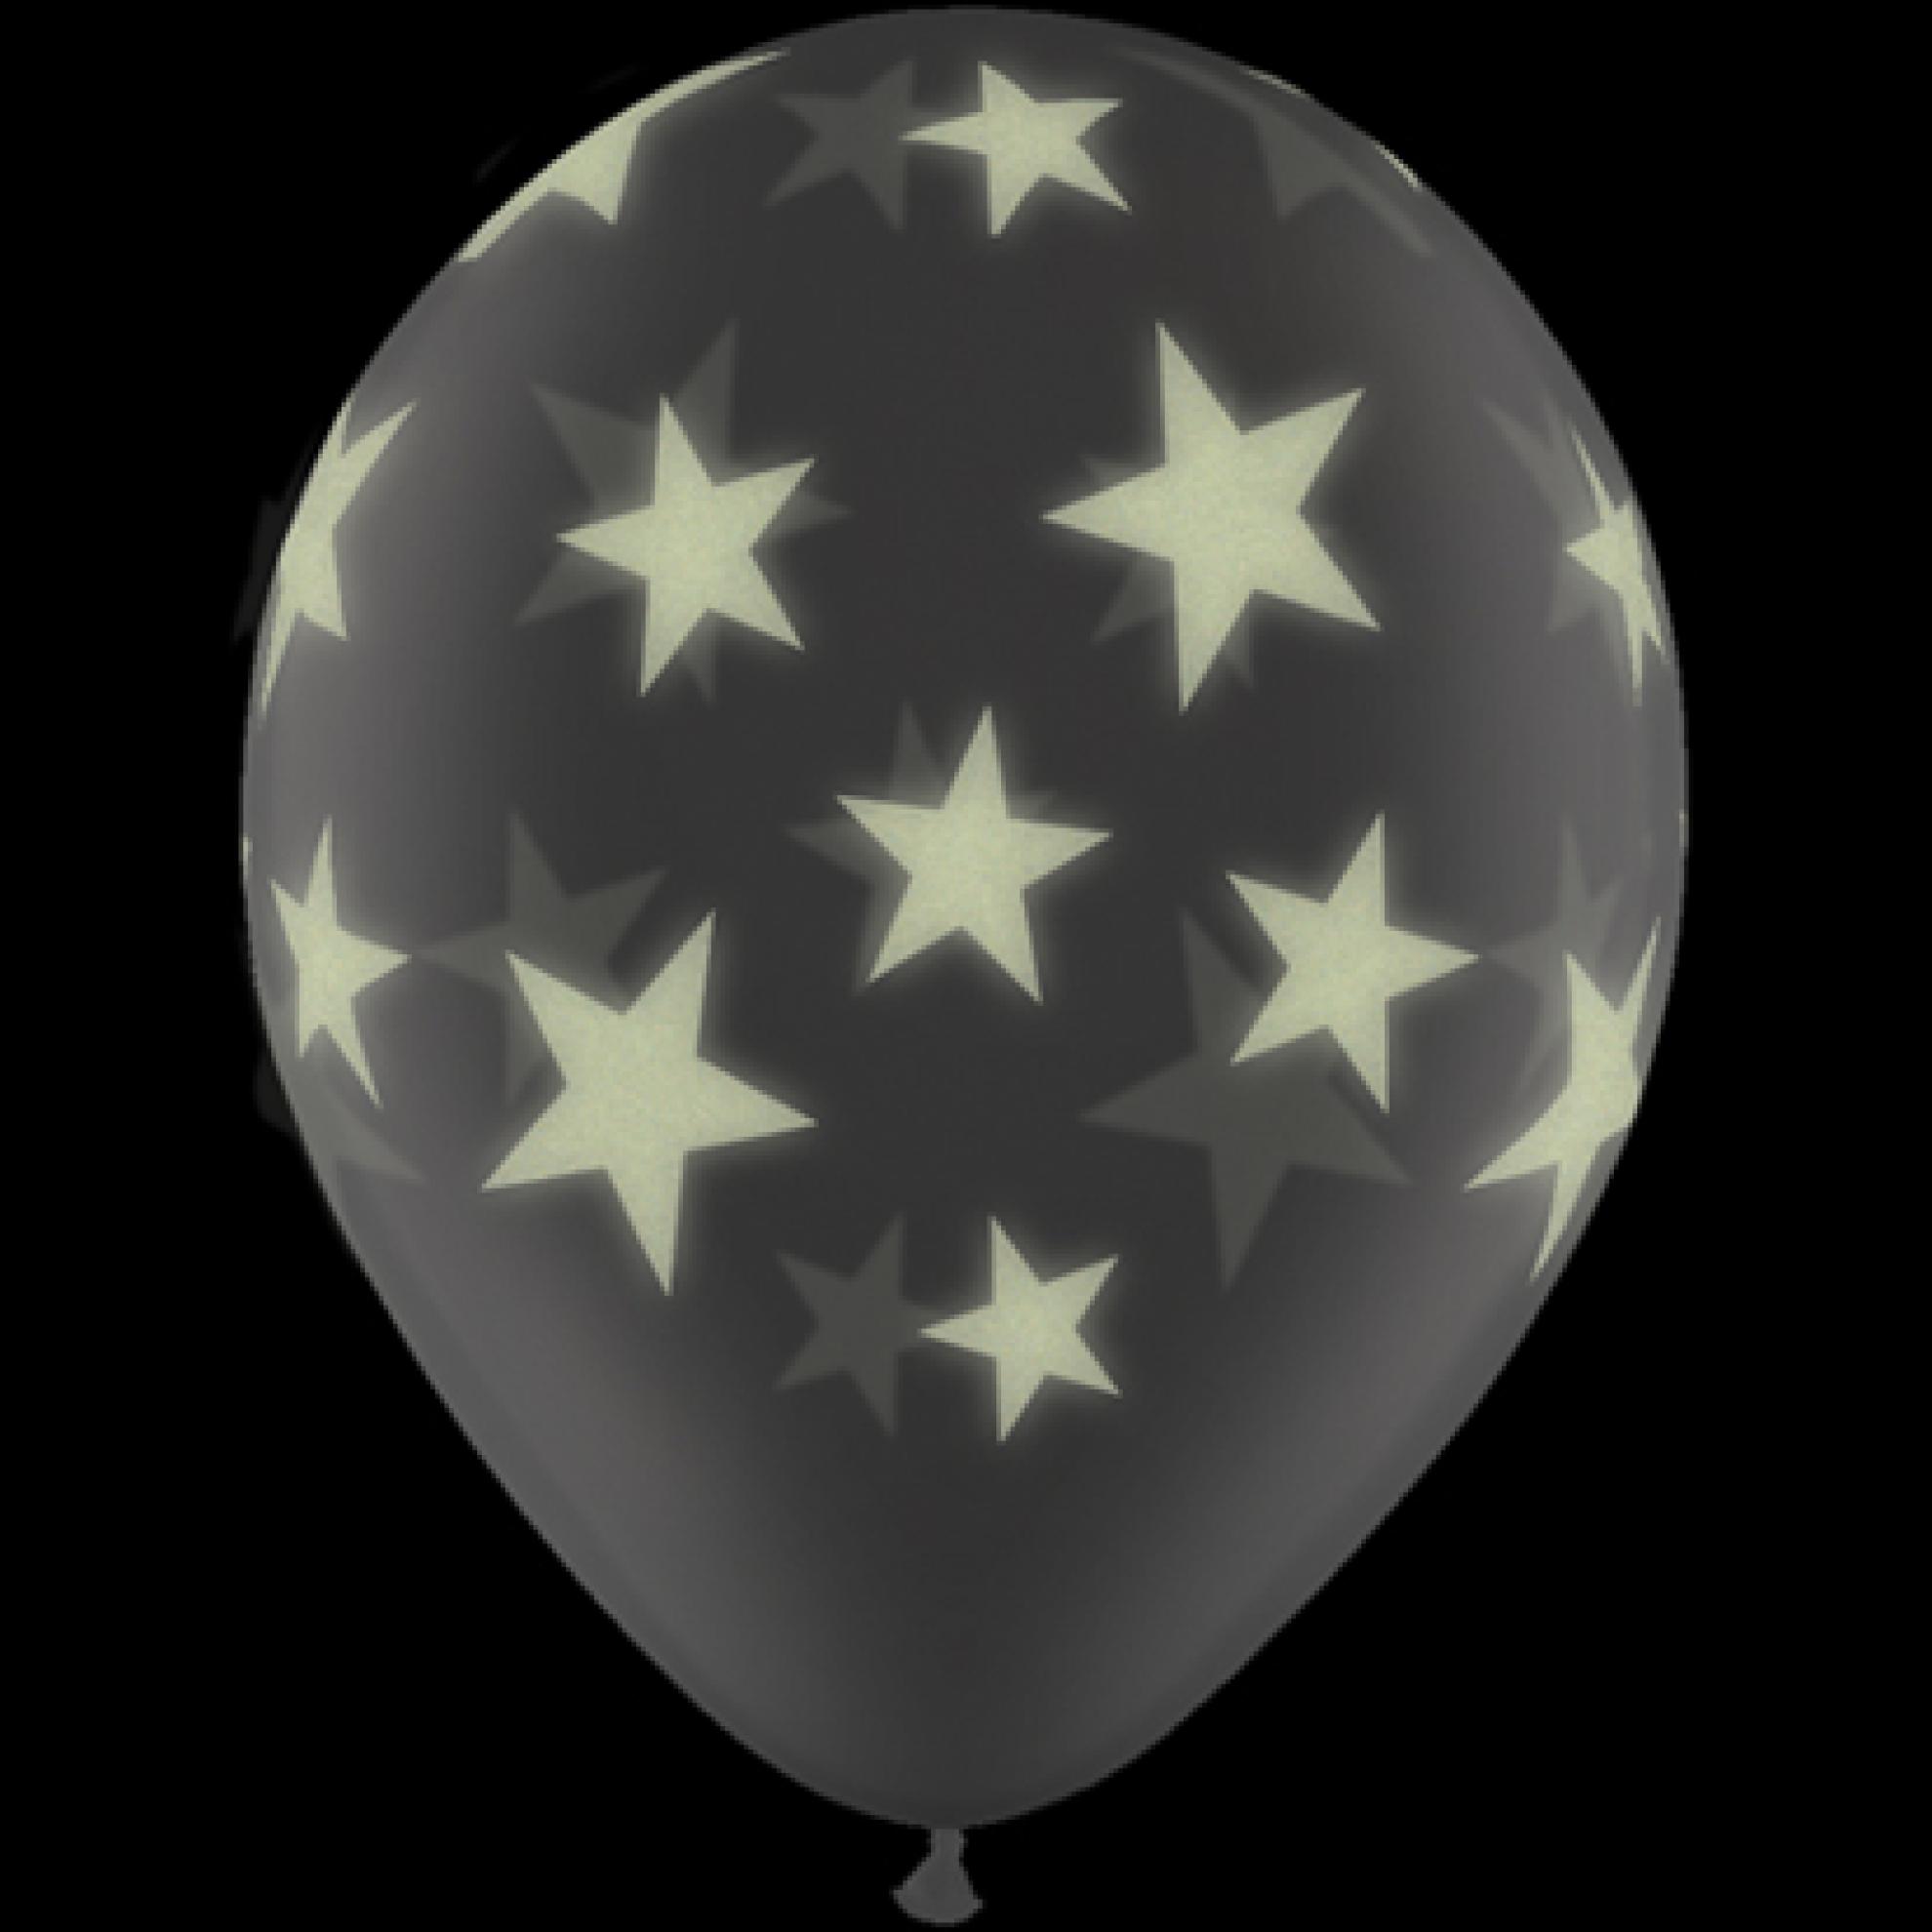 luftballons leuchtsterne kristall durchsichtig 28 cm qualatex 5 st ck. Black Bedroom Furniture Sets. Home Design Ideas